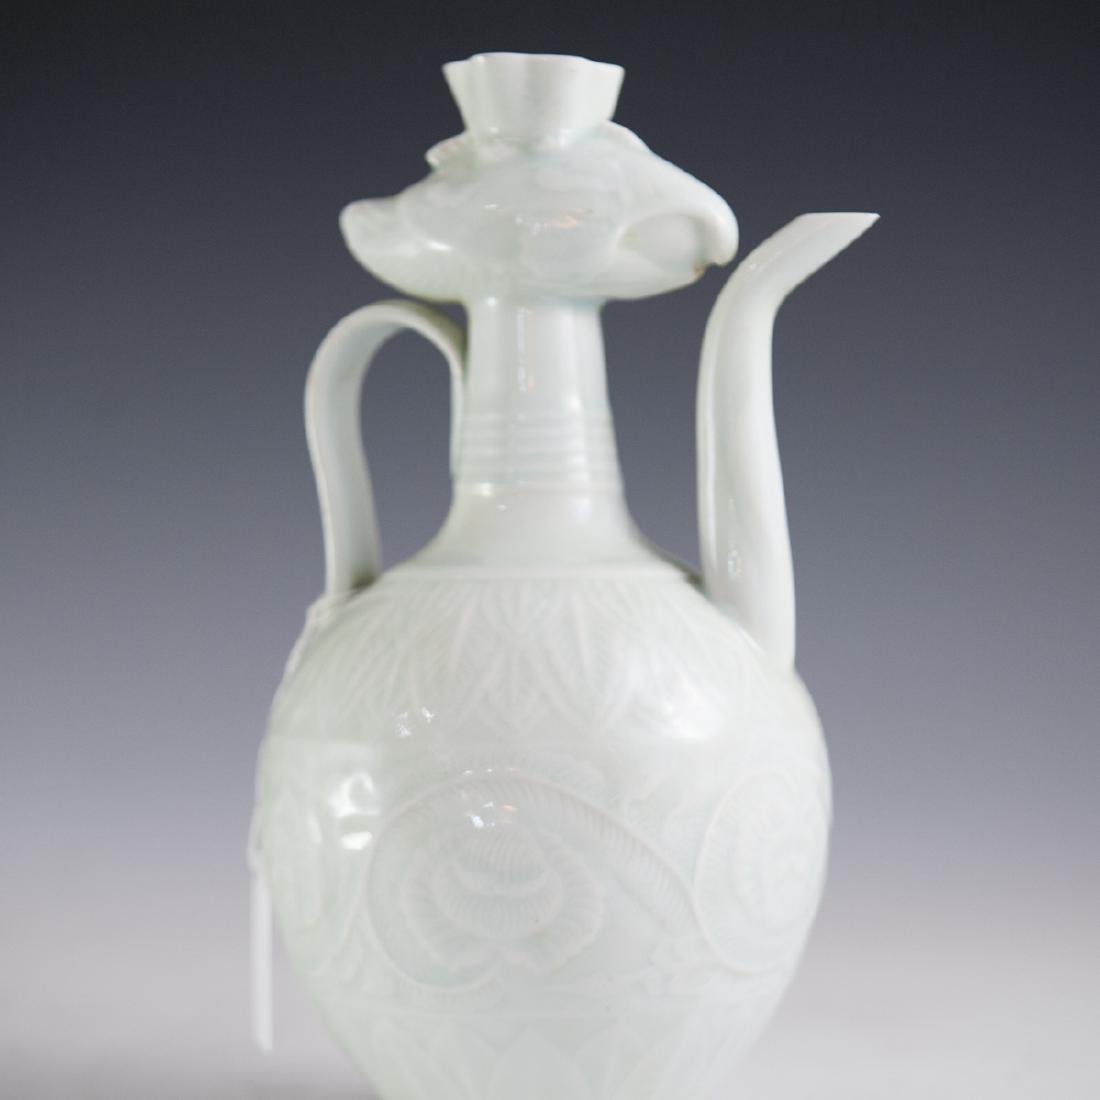 Antique Chinese Celadon Glazed Ewer - 3